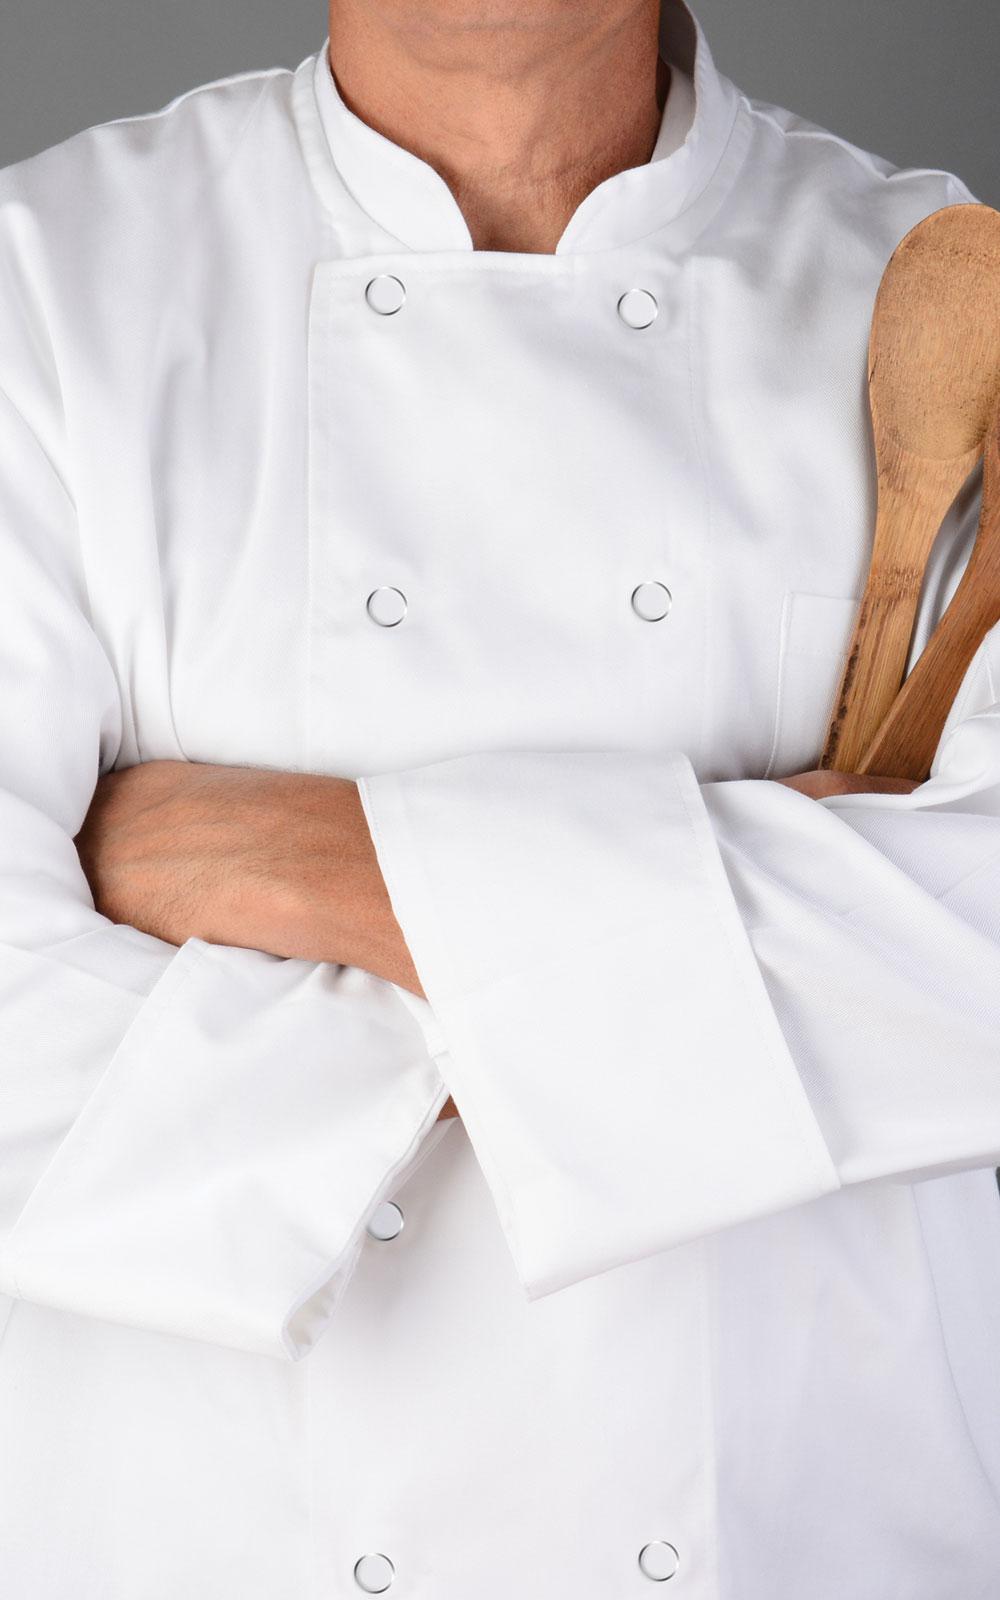 Executive-Chef-Jacket-3